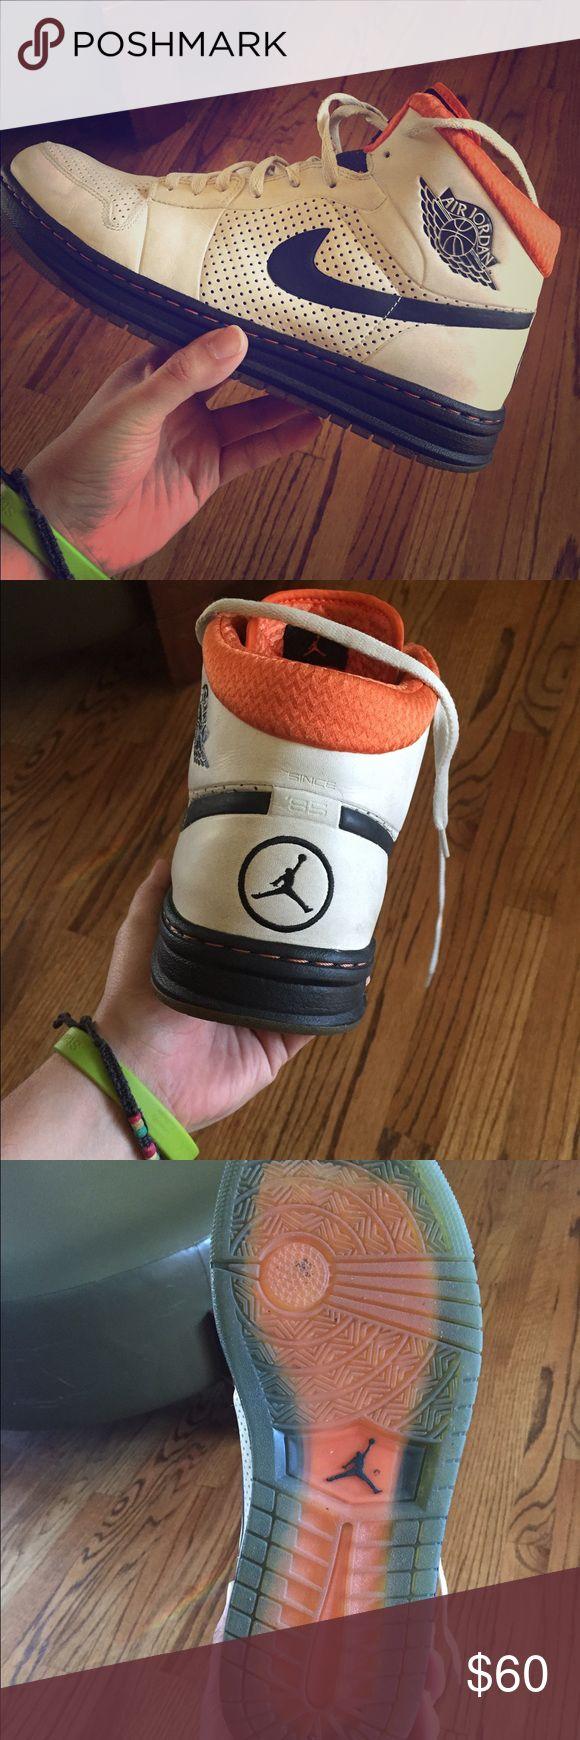 Jordan's 1 black history month Clean Jordan's only wore few times Jordan Shoes Athletic Shoes